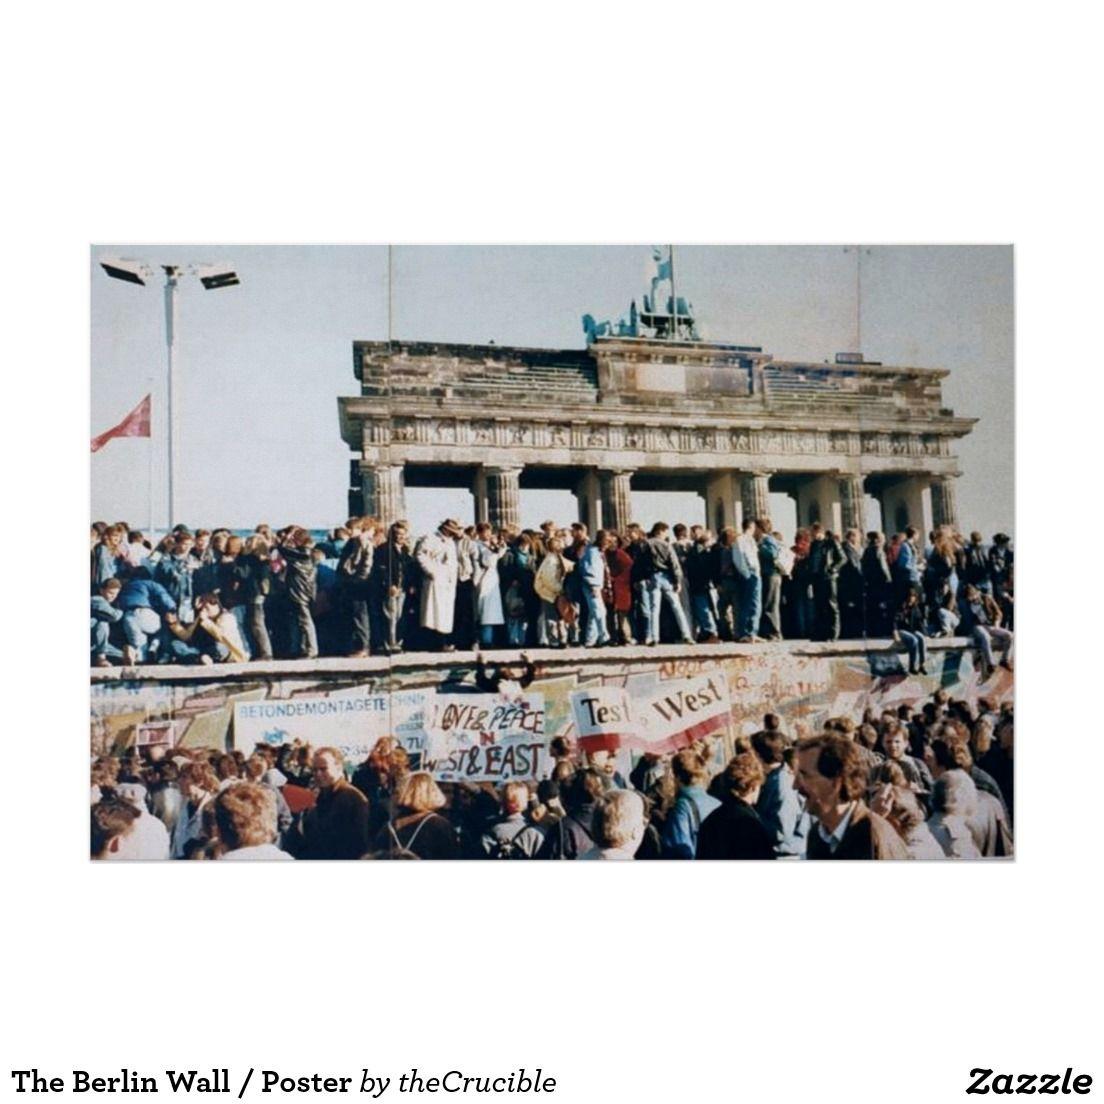 El muro de Berlín/el poster